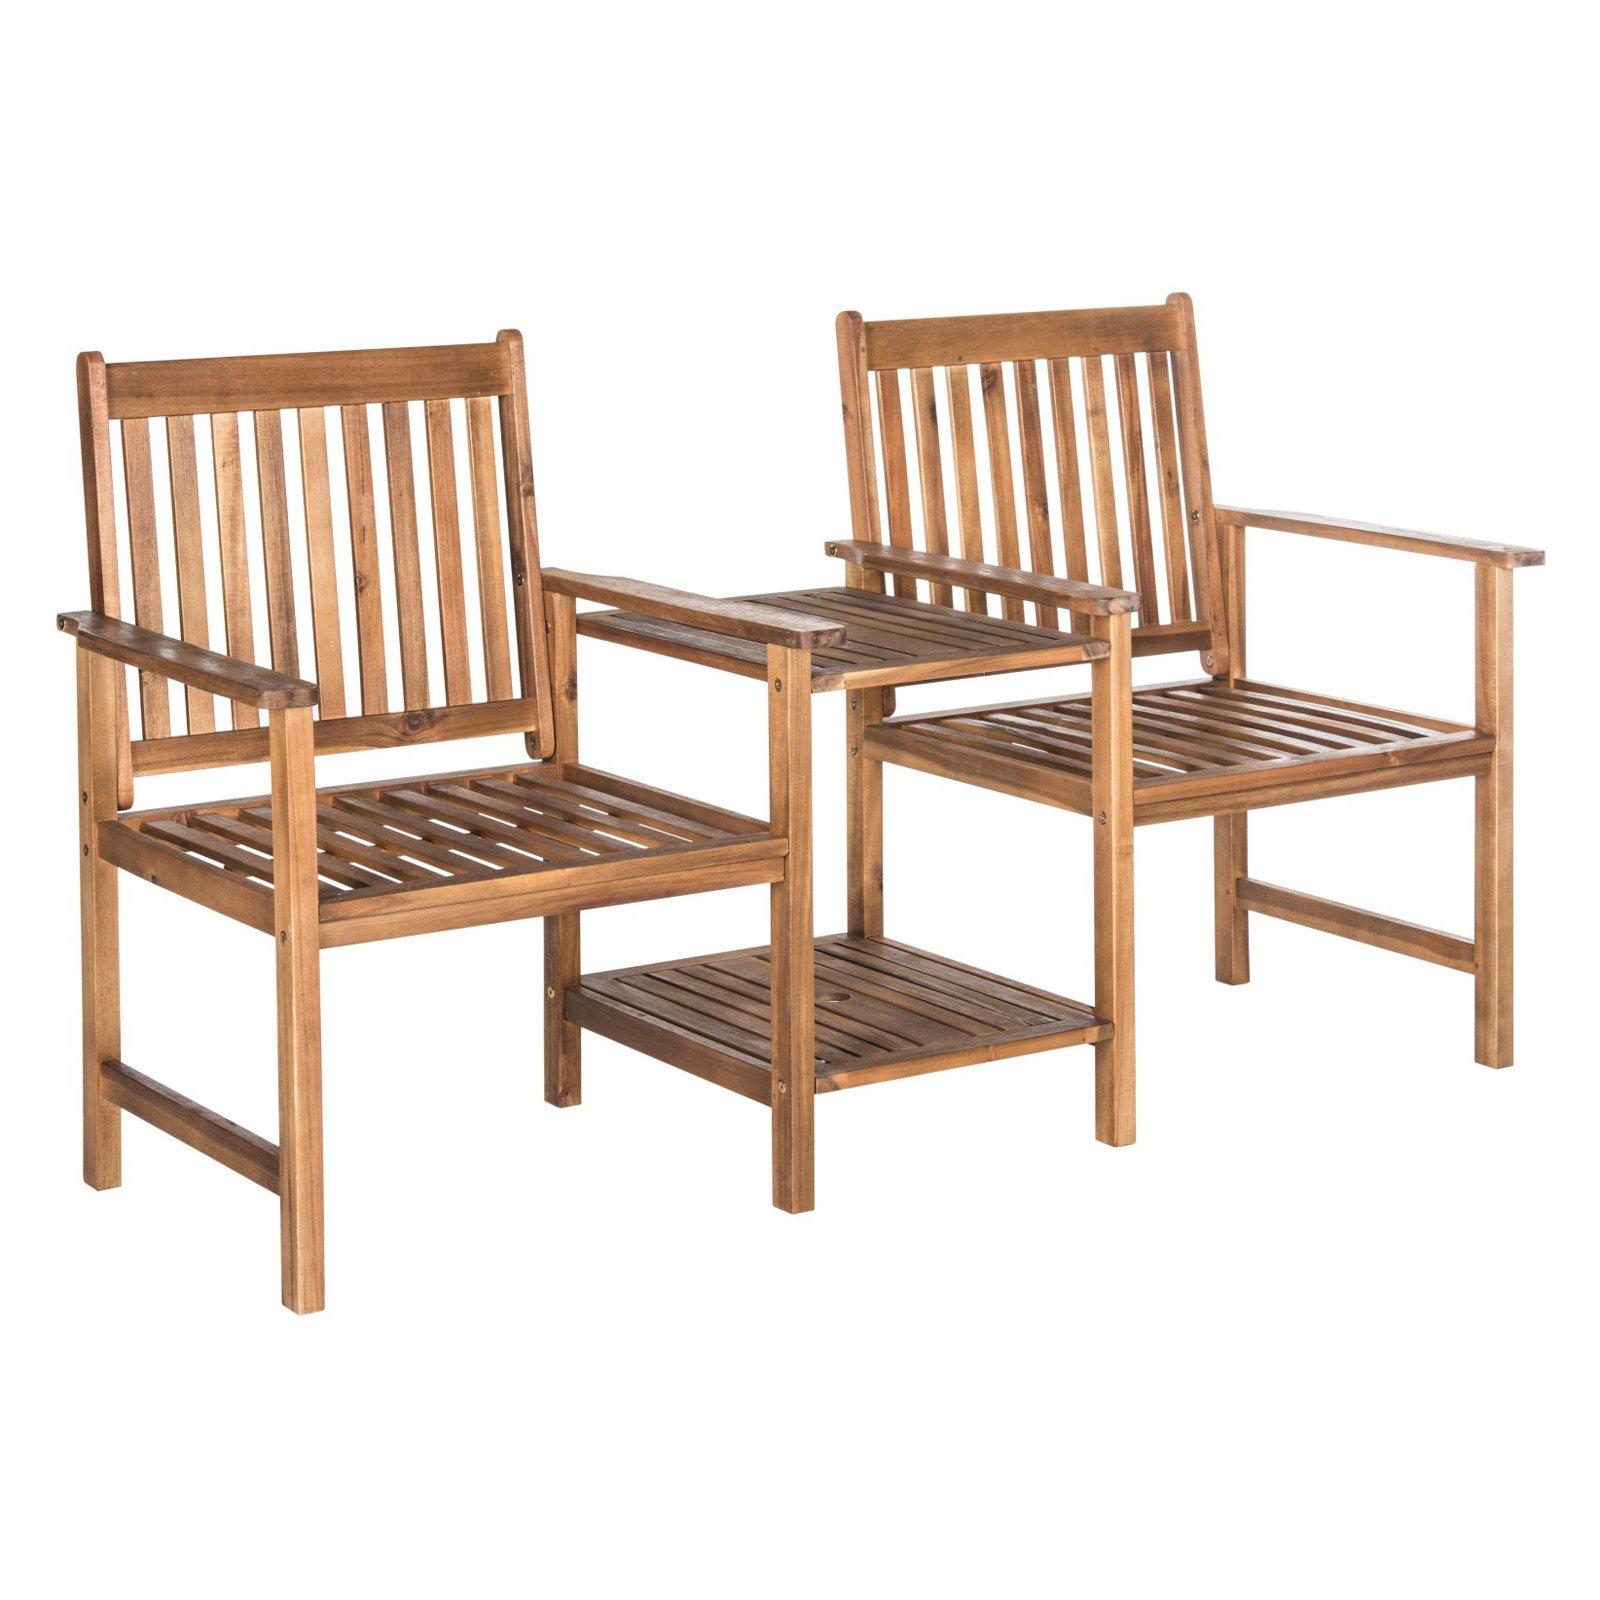 Safavieh Brea Outdoor Twin Seat Bench by Safavieh